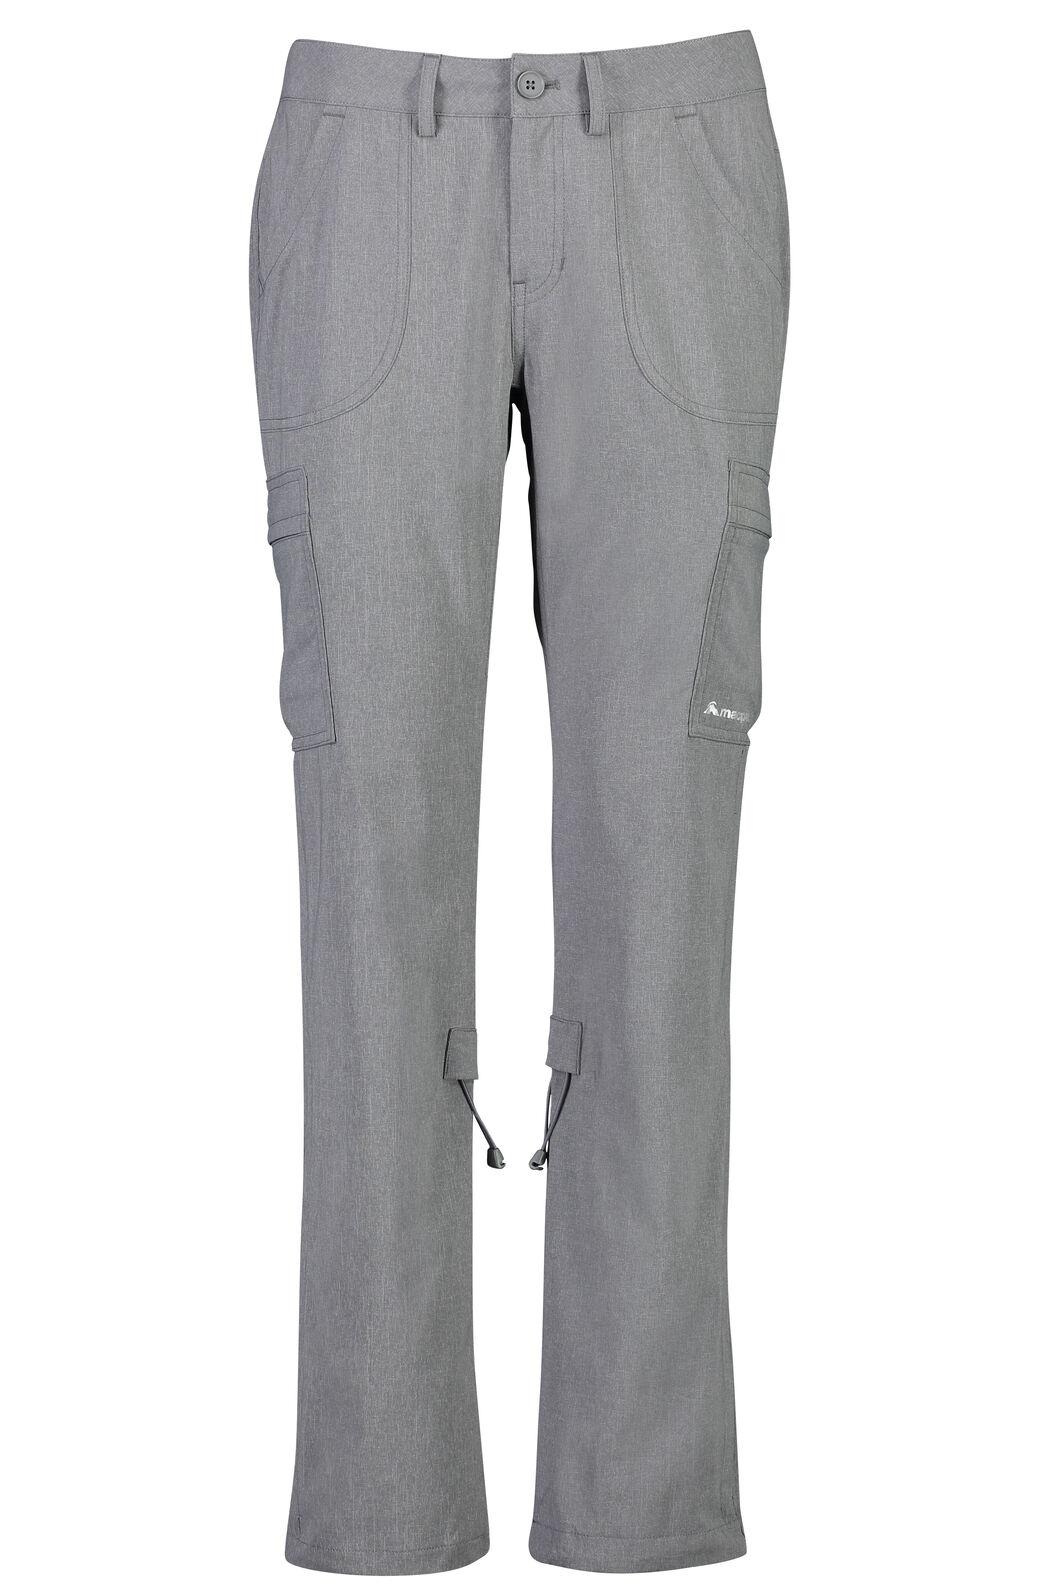 Macpac It's a Cinch Pants - Women's, Iron Gate, hi-res